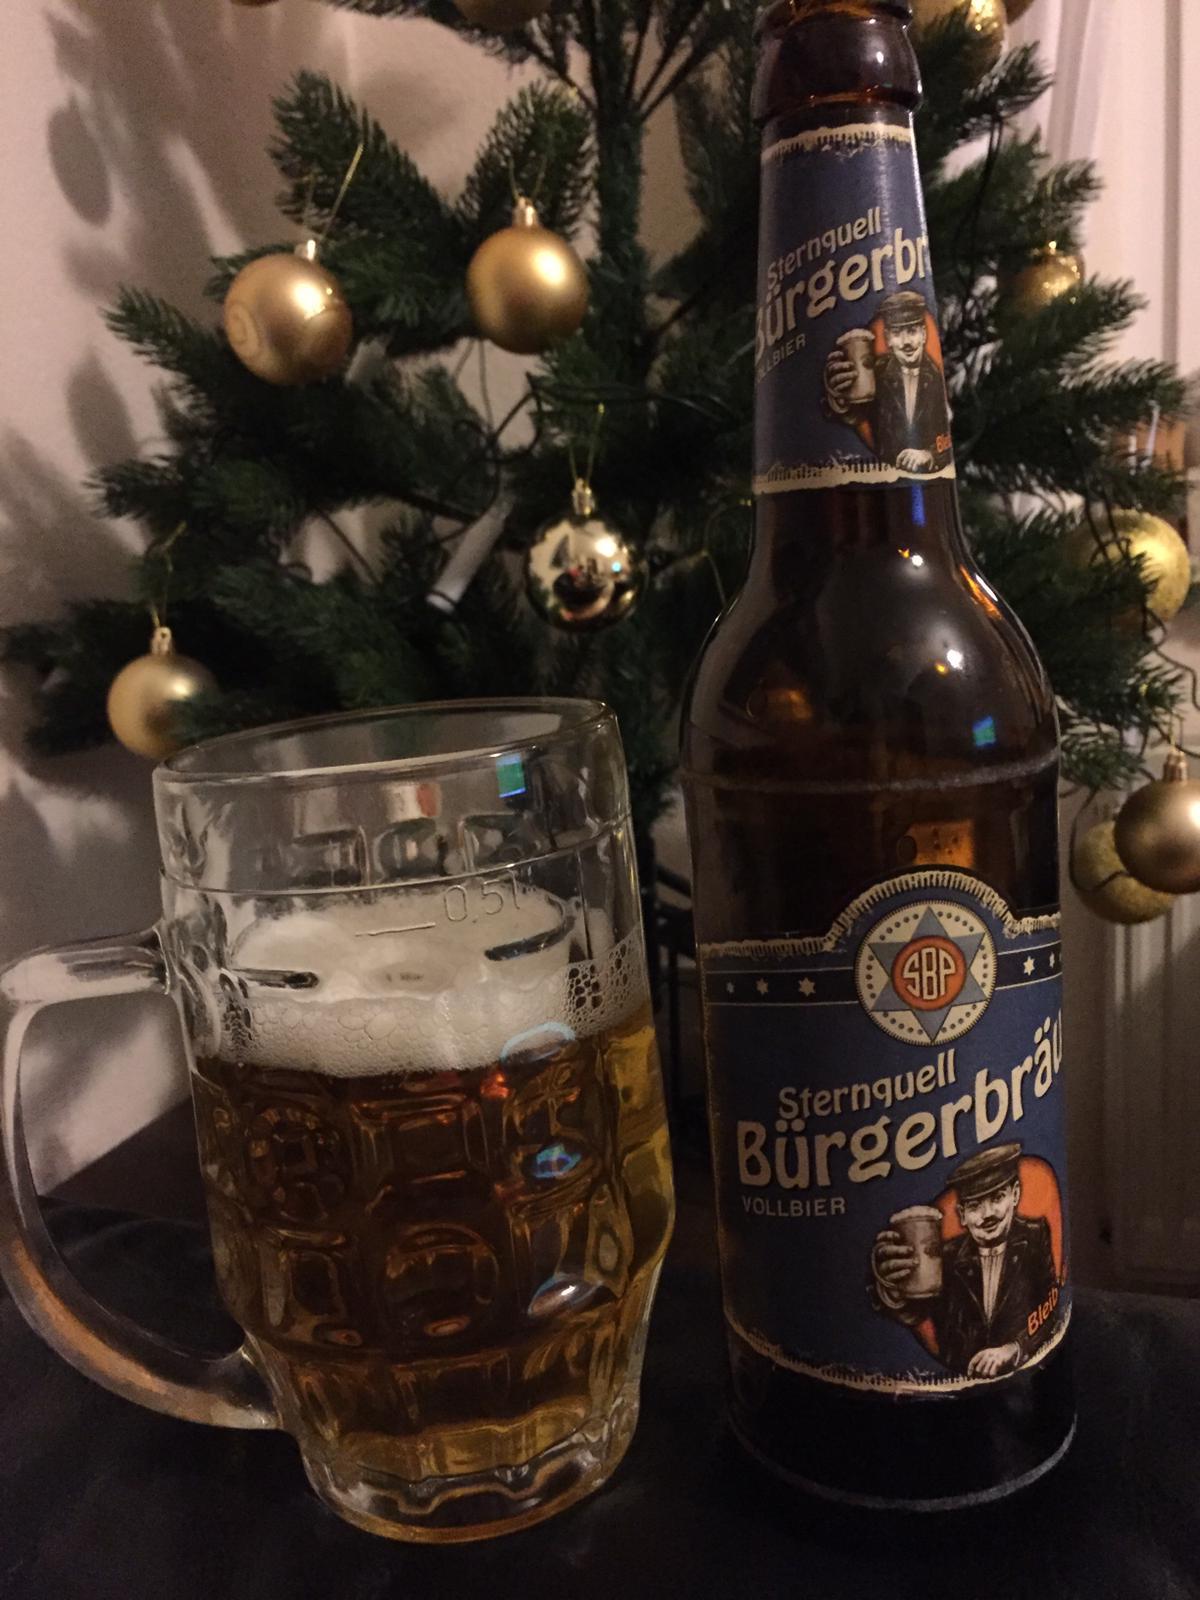 Bieradvent (Zwönitzer Edition) Sternquell – Bürgerbräu